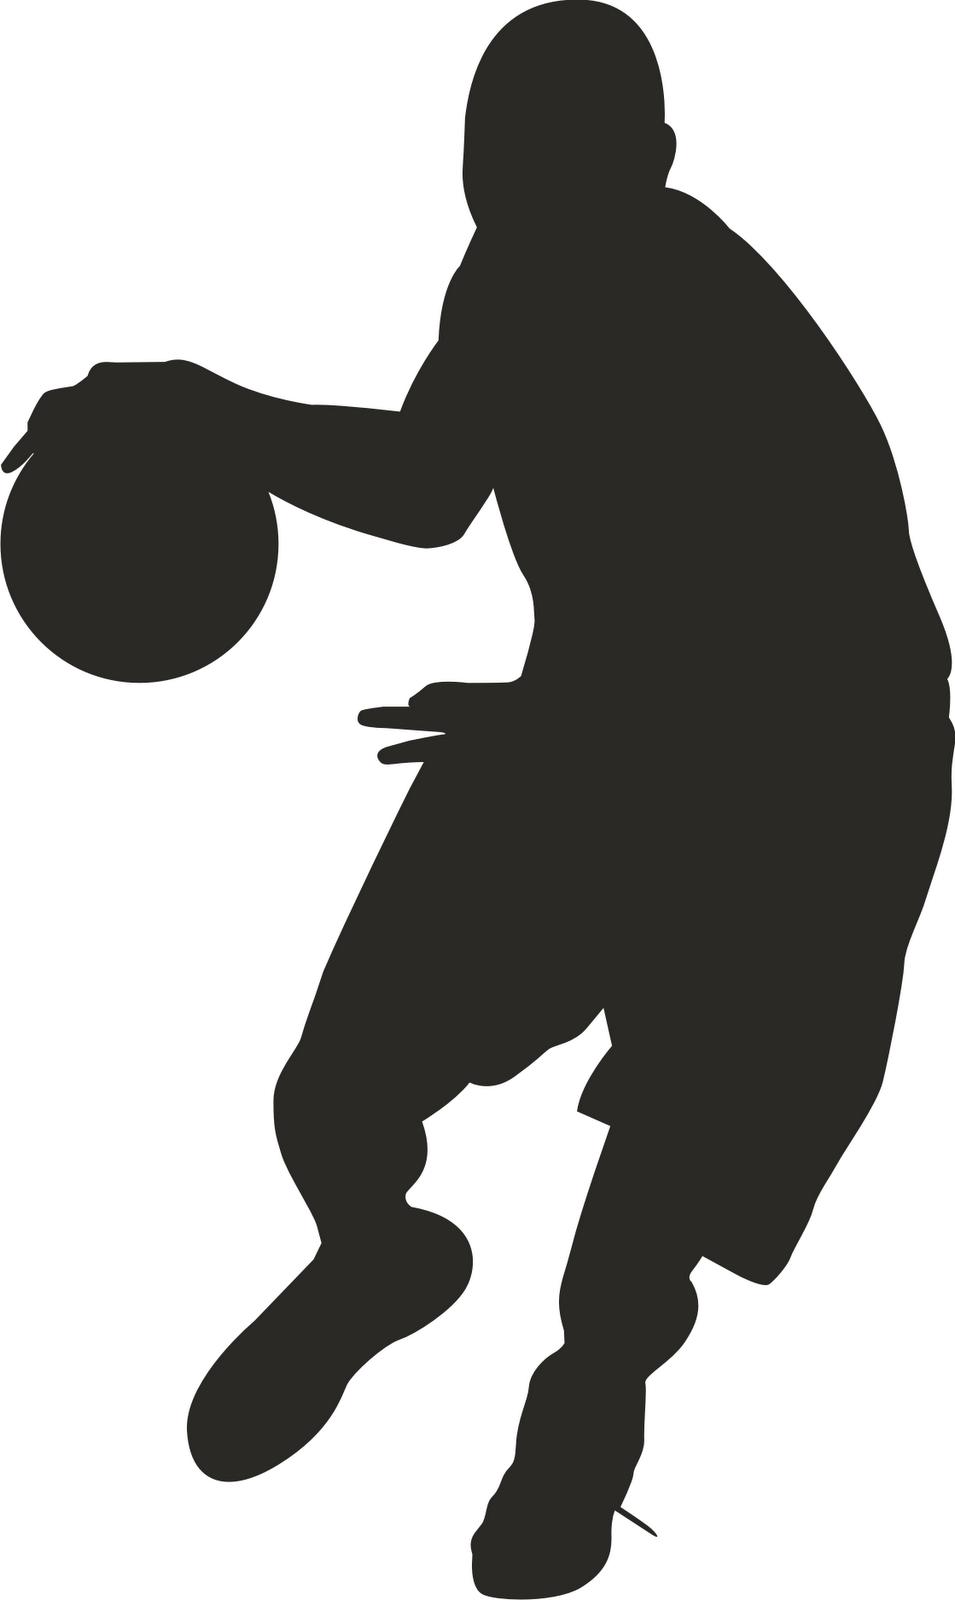 Clipart basketball basketball player. Players panda free images